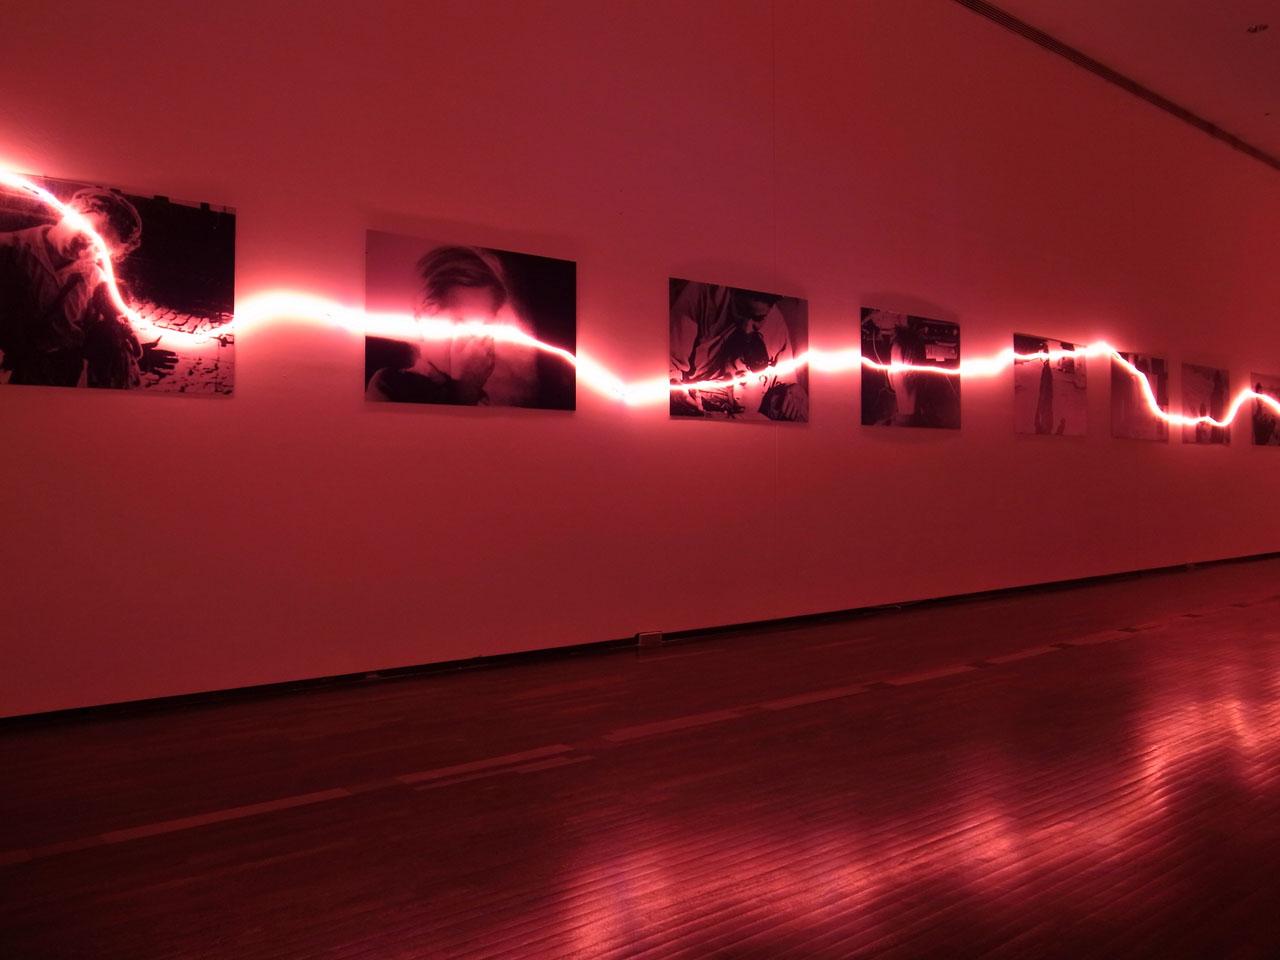 Jlggbblog3 n on for Neon artiste contemporain